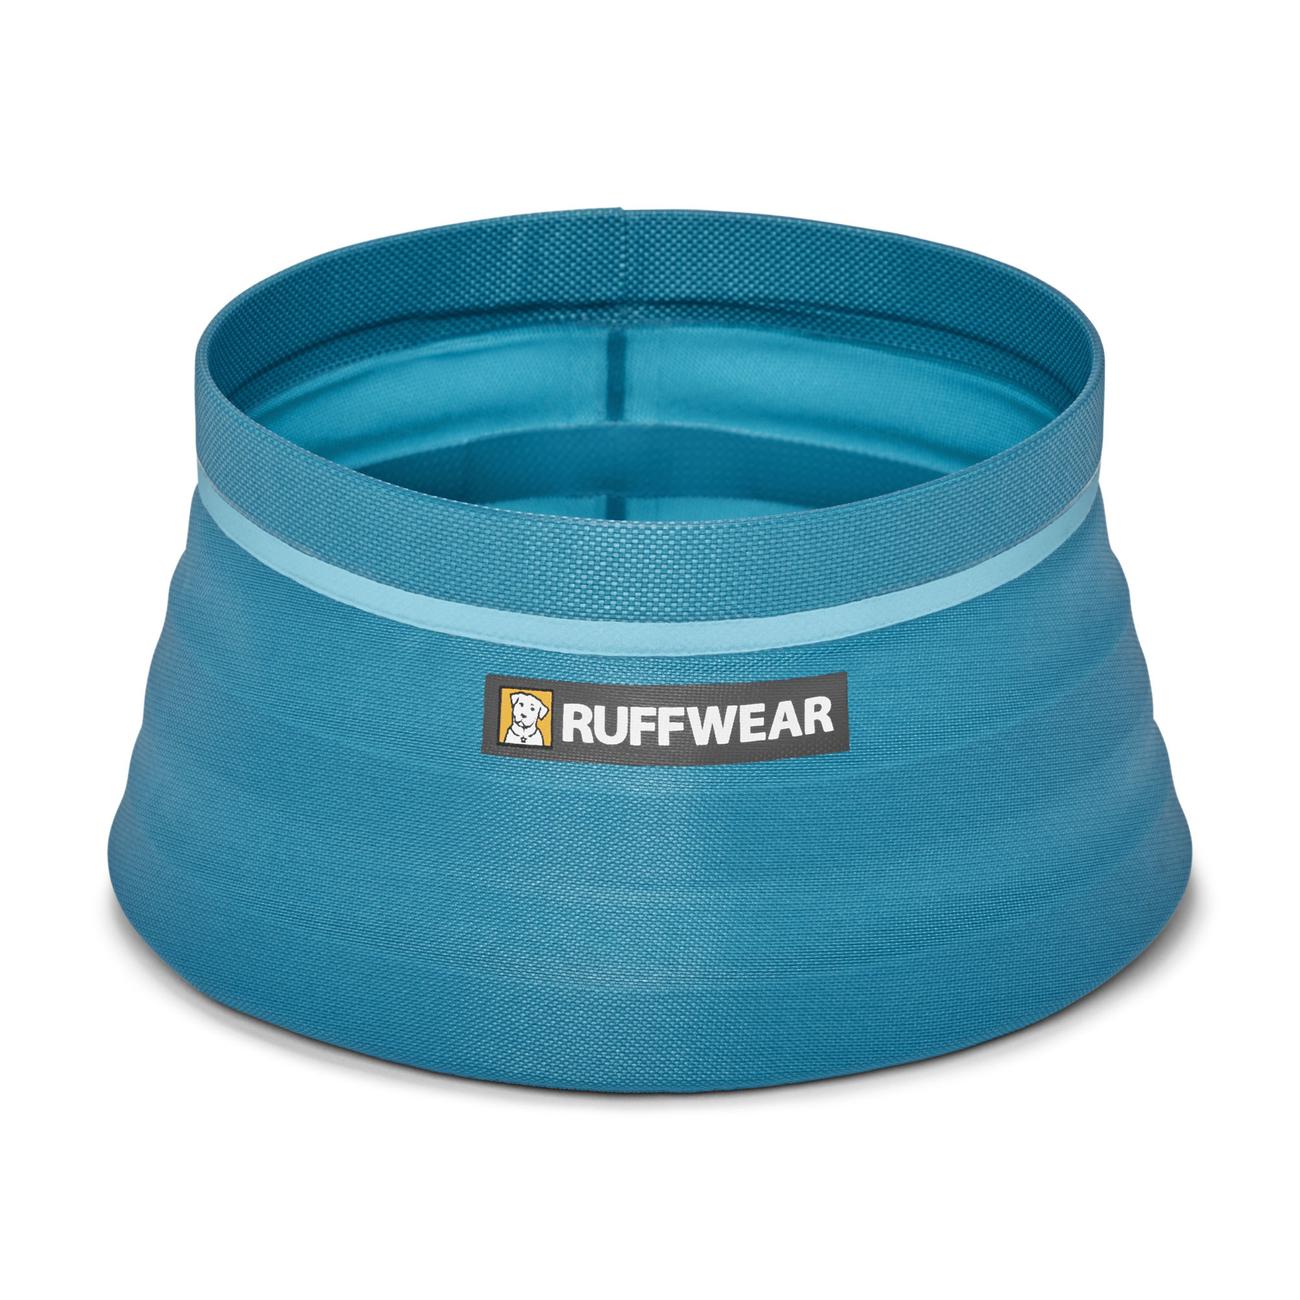 Ruffwear Bivy Bowl Outdoor Hundenapf, Bild 3